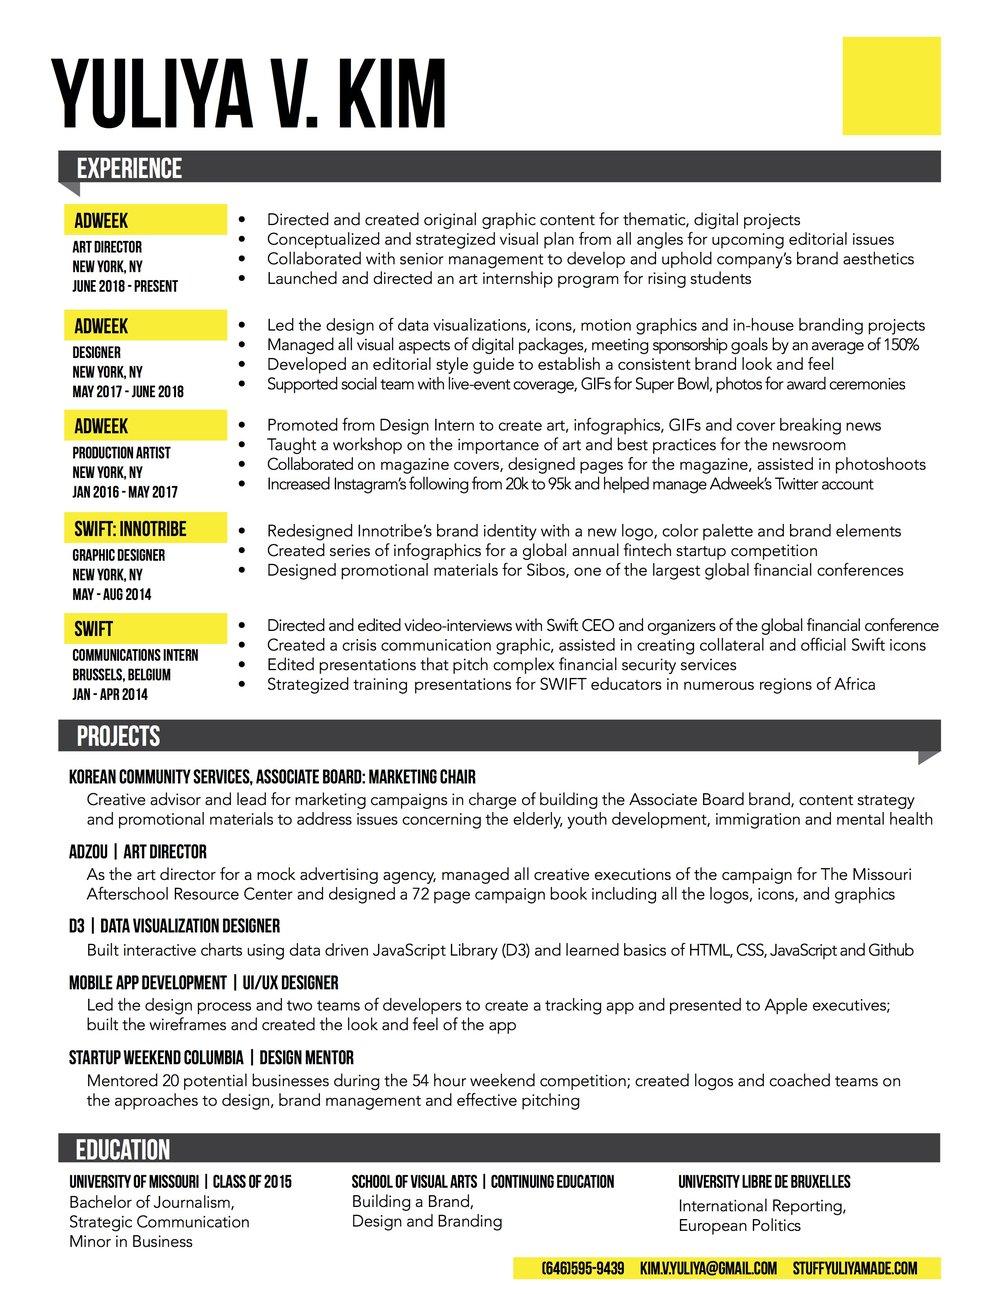 Yuliya Kim Final Resume - 2018.jpg